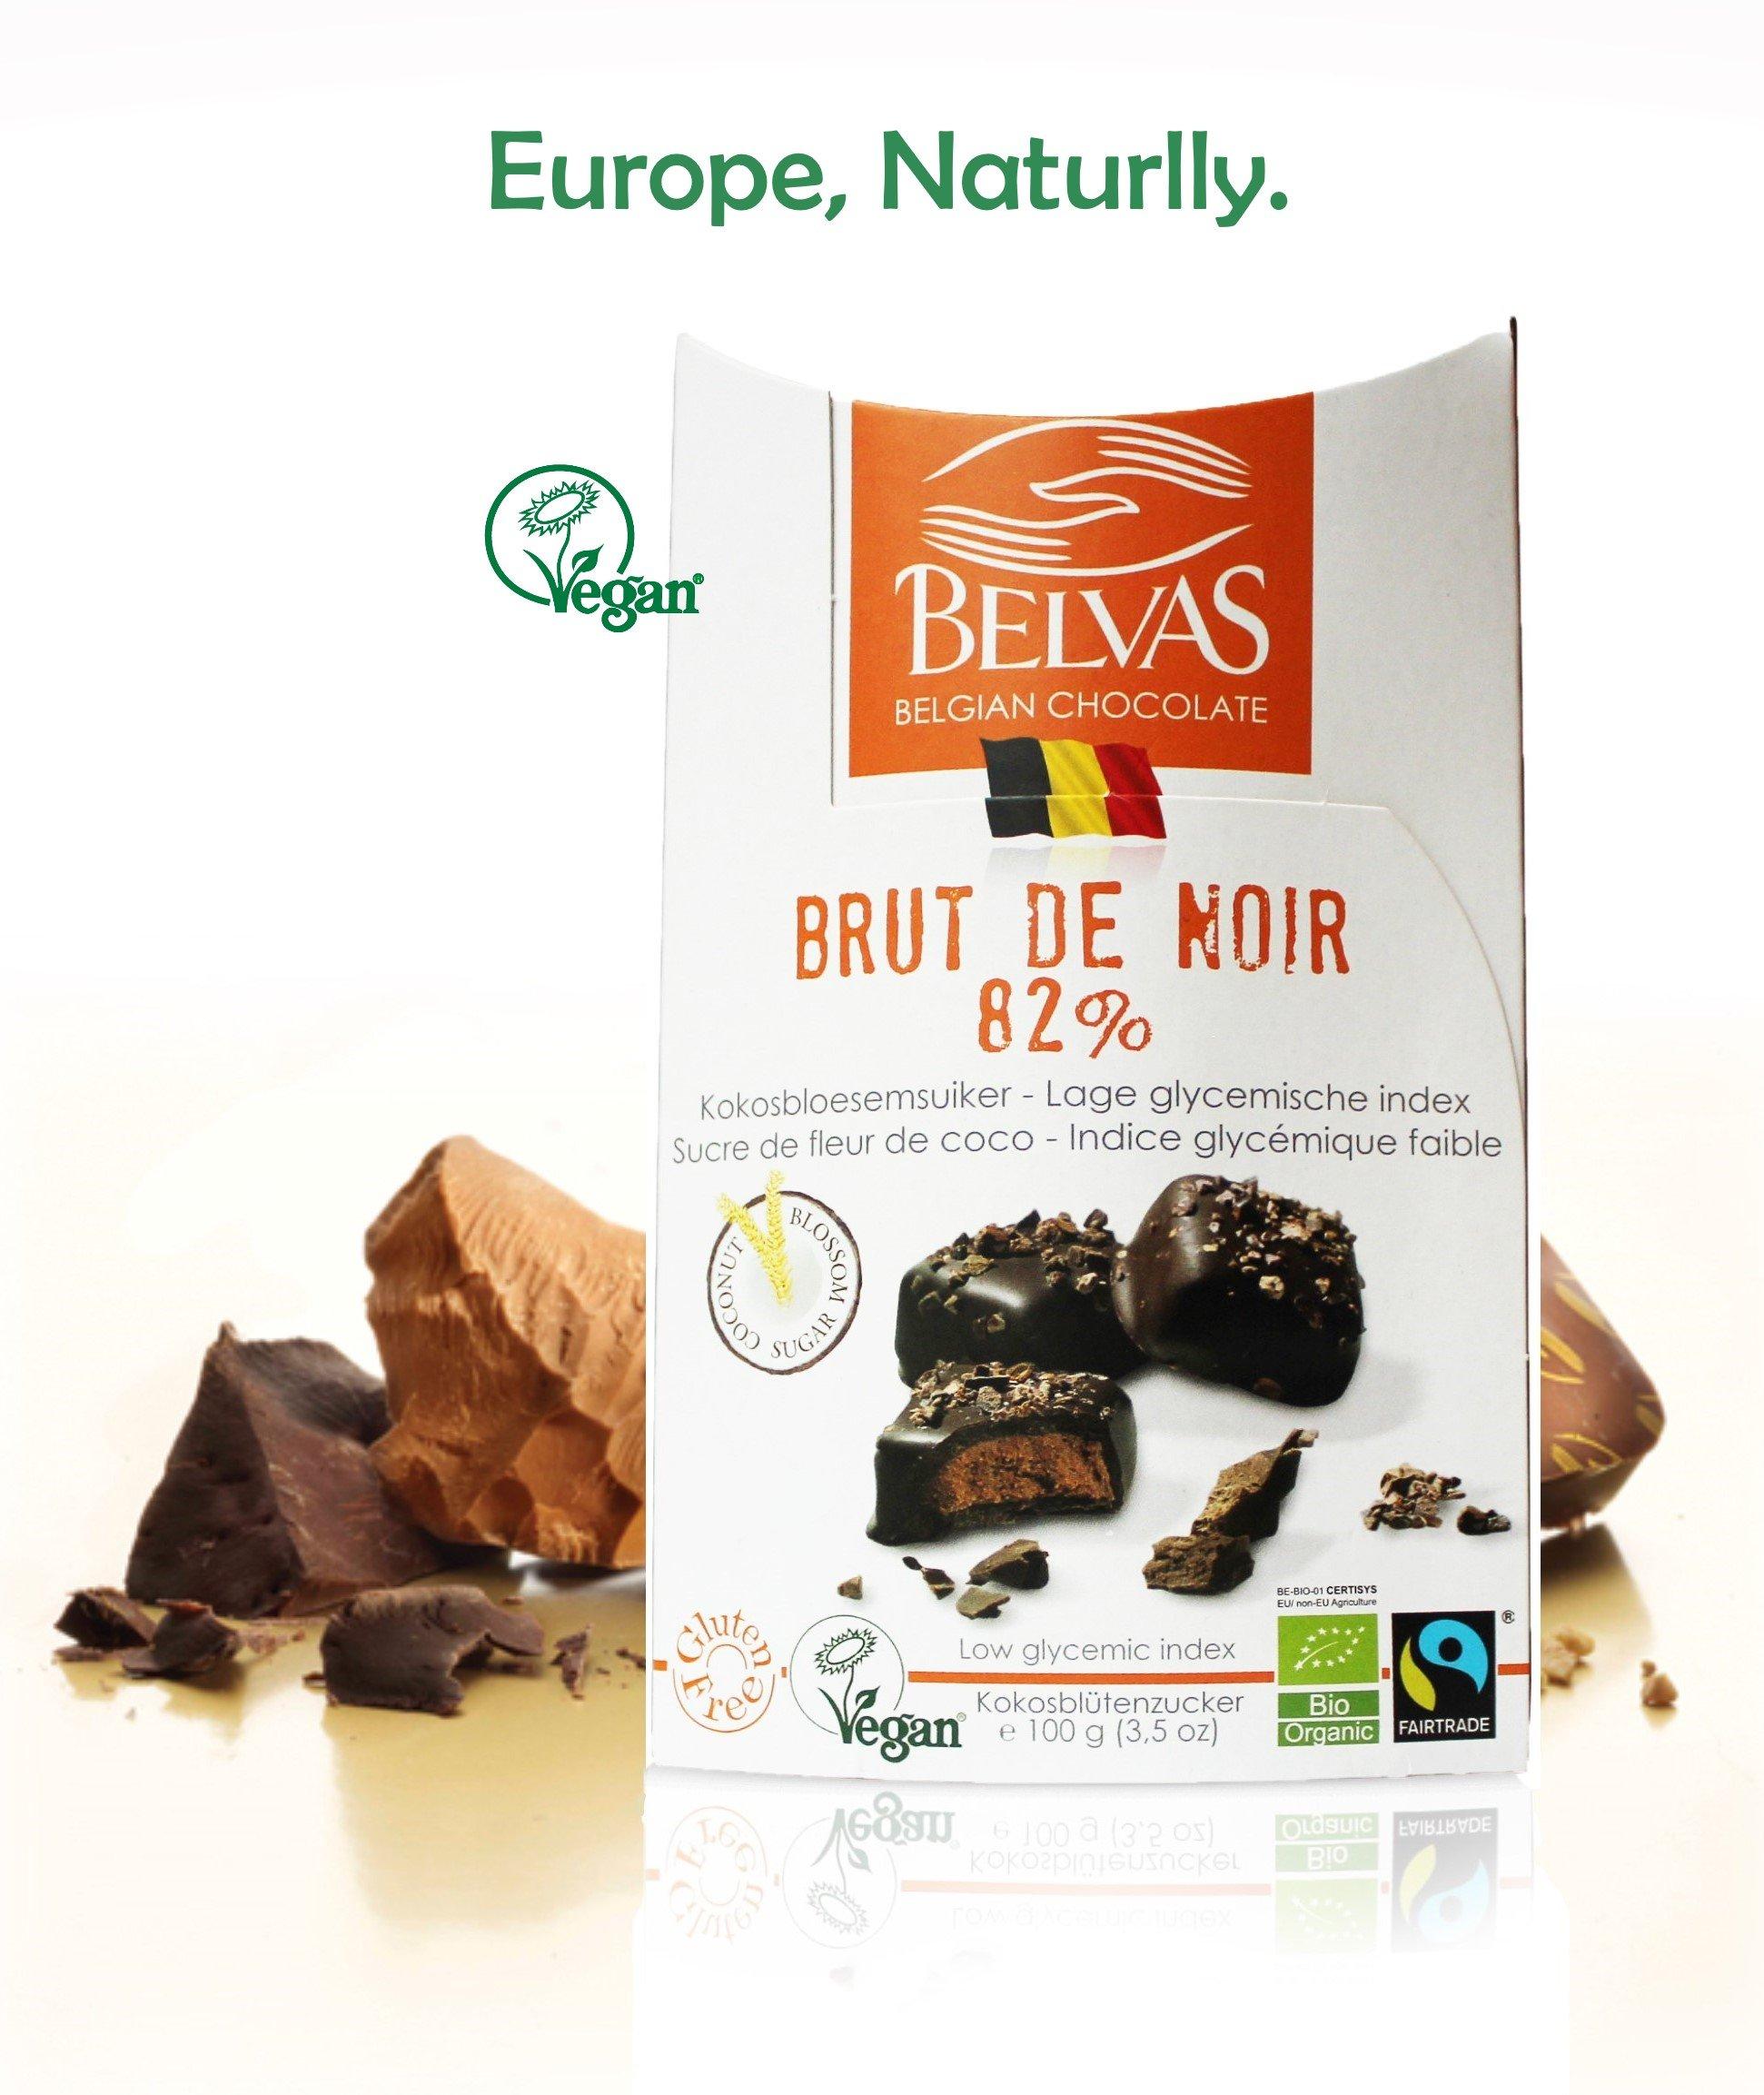 Vegan Chocolate Brut De Noir: Dark & Delicate. Low Glycemic index, Organic, Fair Trade, Gluten Free. Sublime Belgian chocolate. Award winning vegan candy Delights. 3.5oz. Perfect Gift for Vegans.